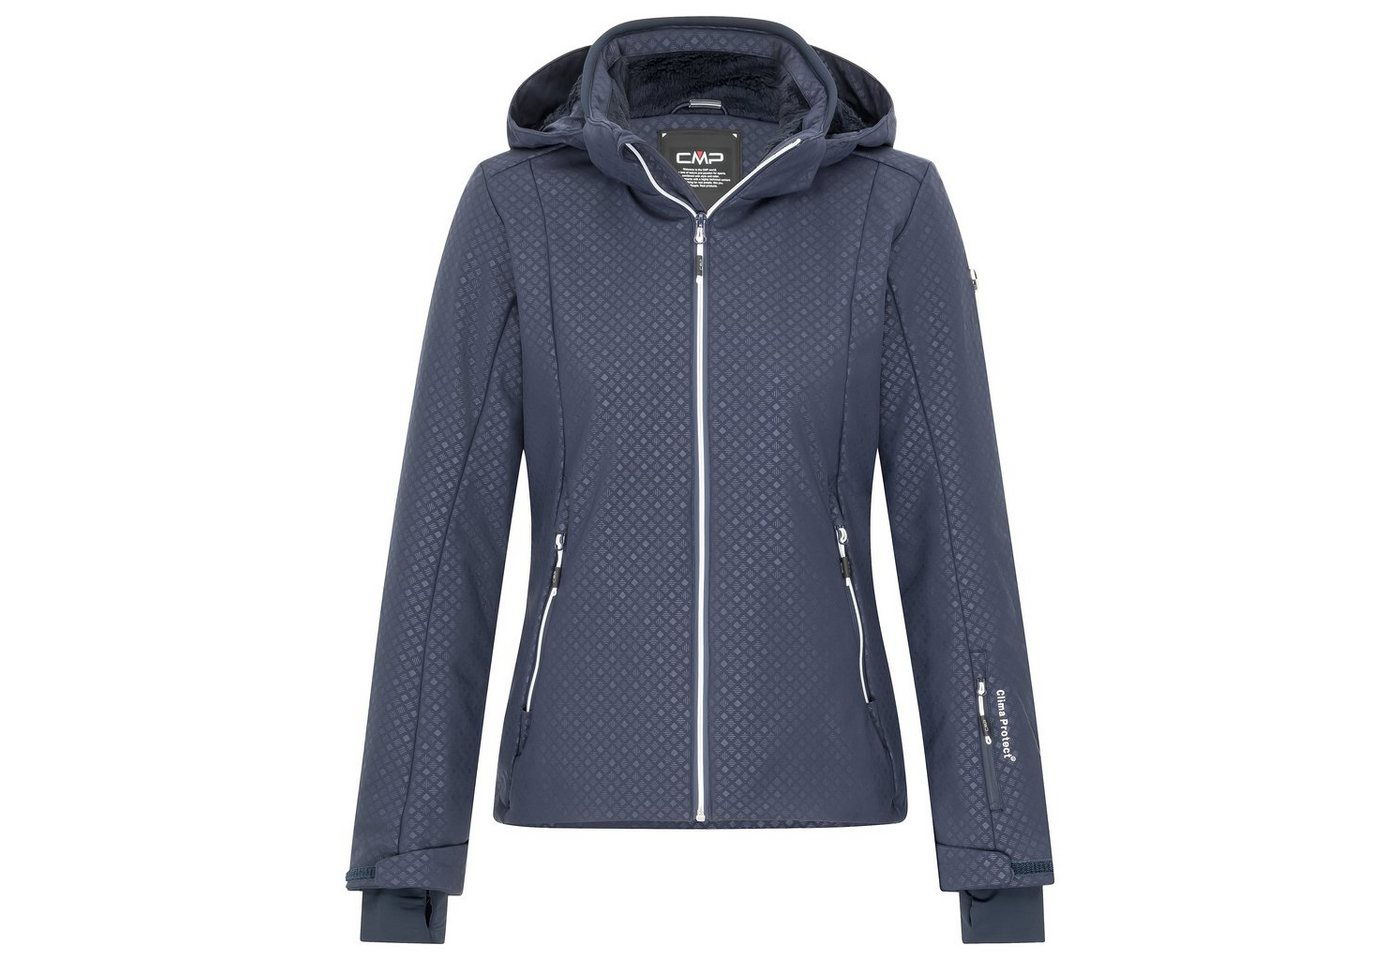 CMP Skijacke »38W0696-U901« | Sportbekleidung > Sportjacken > Skijacken | Blau | Fleece | CMP